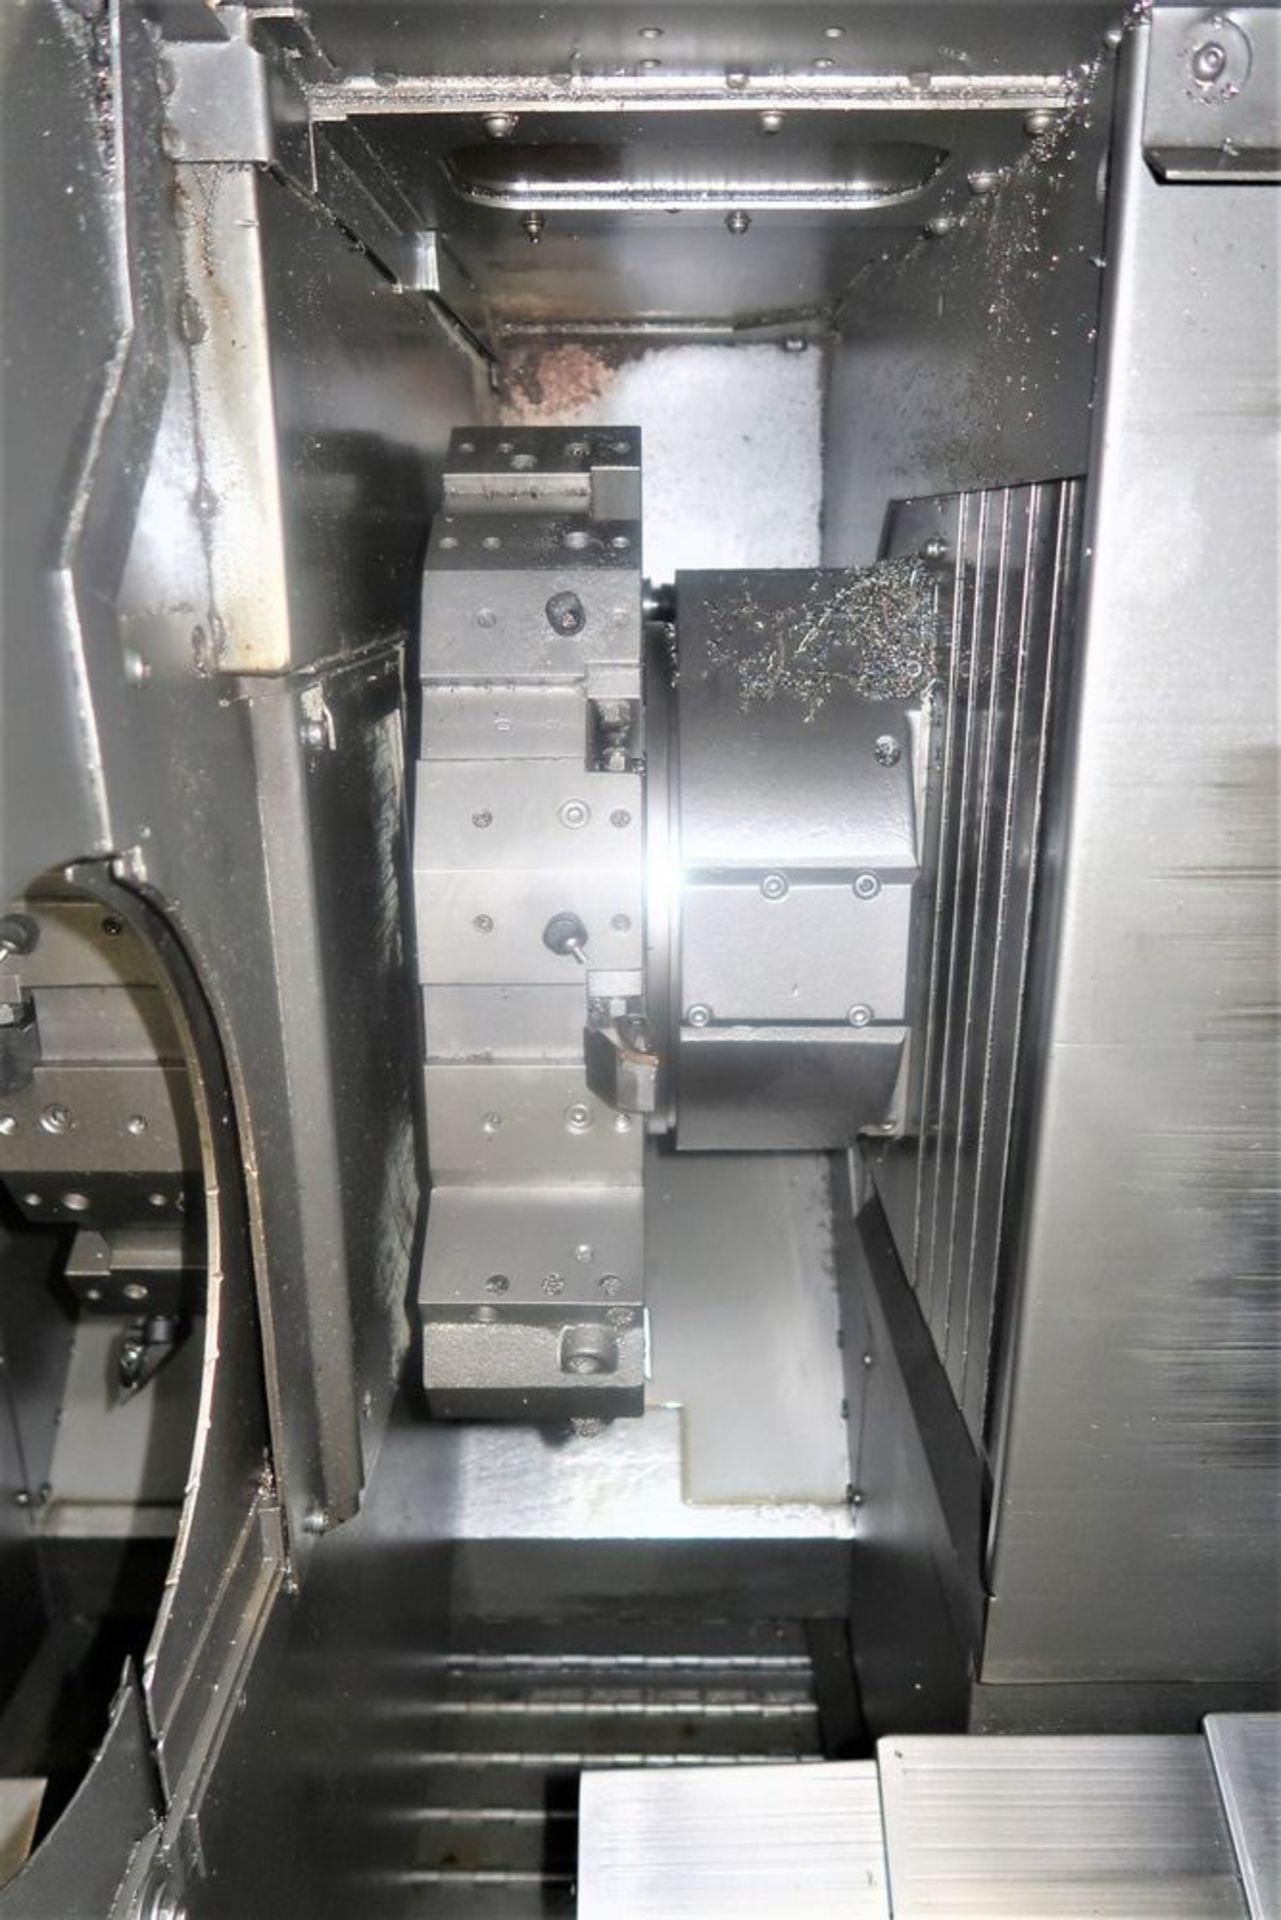 Mazak Dual Turn 25 Twin Spindle CNC Turning Center lathe, S/N 150888 - Image 8 of 13